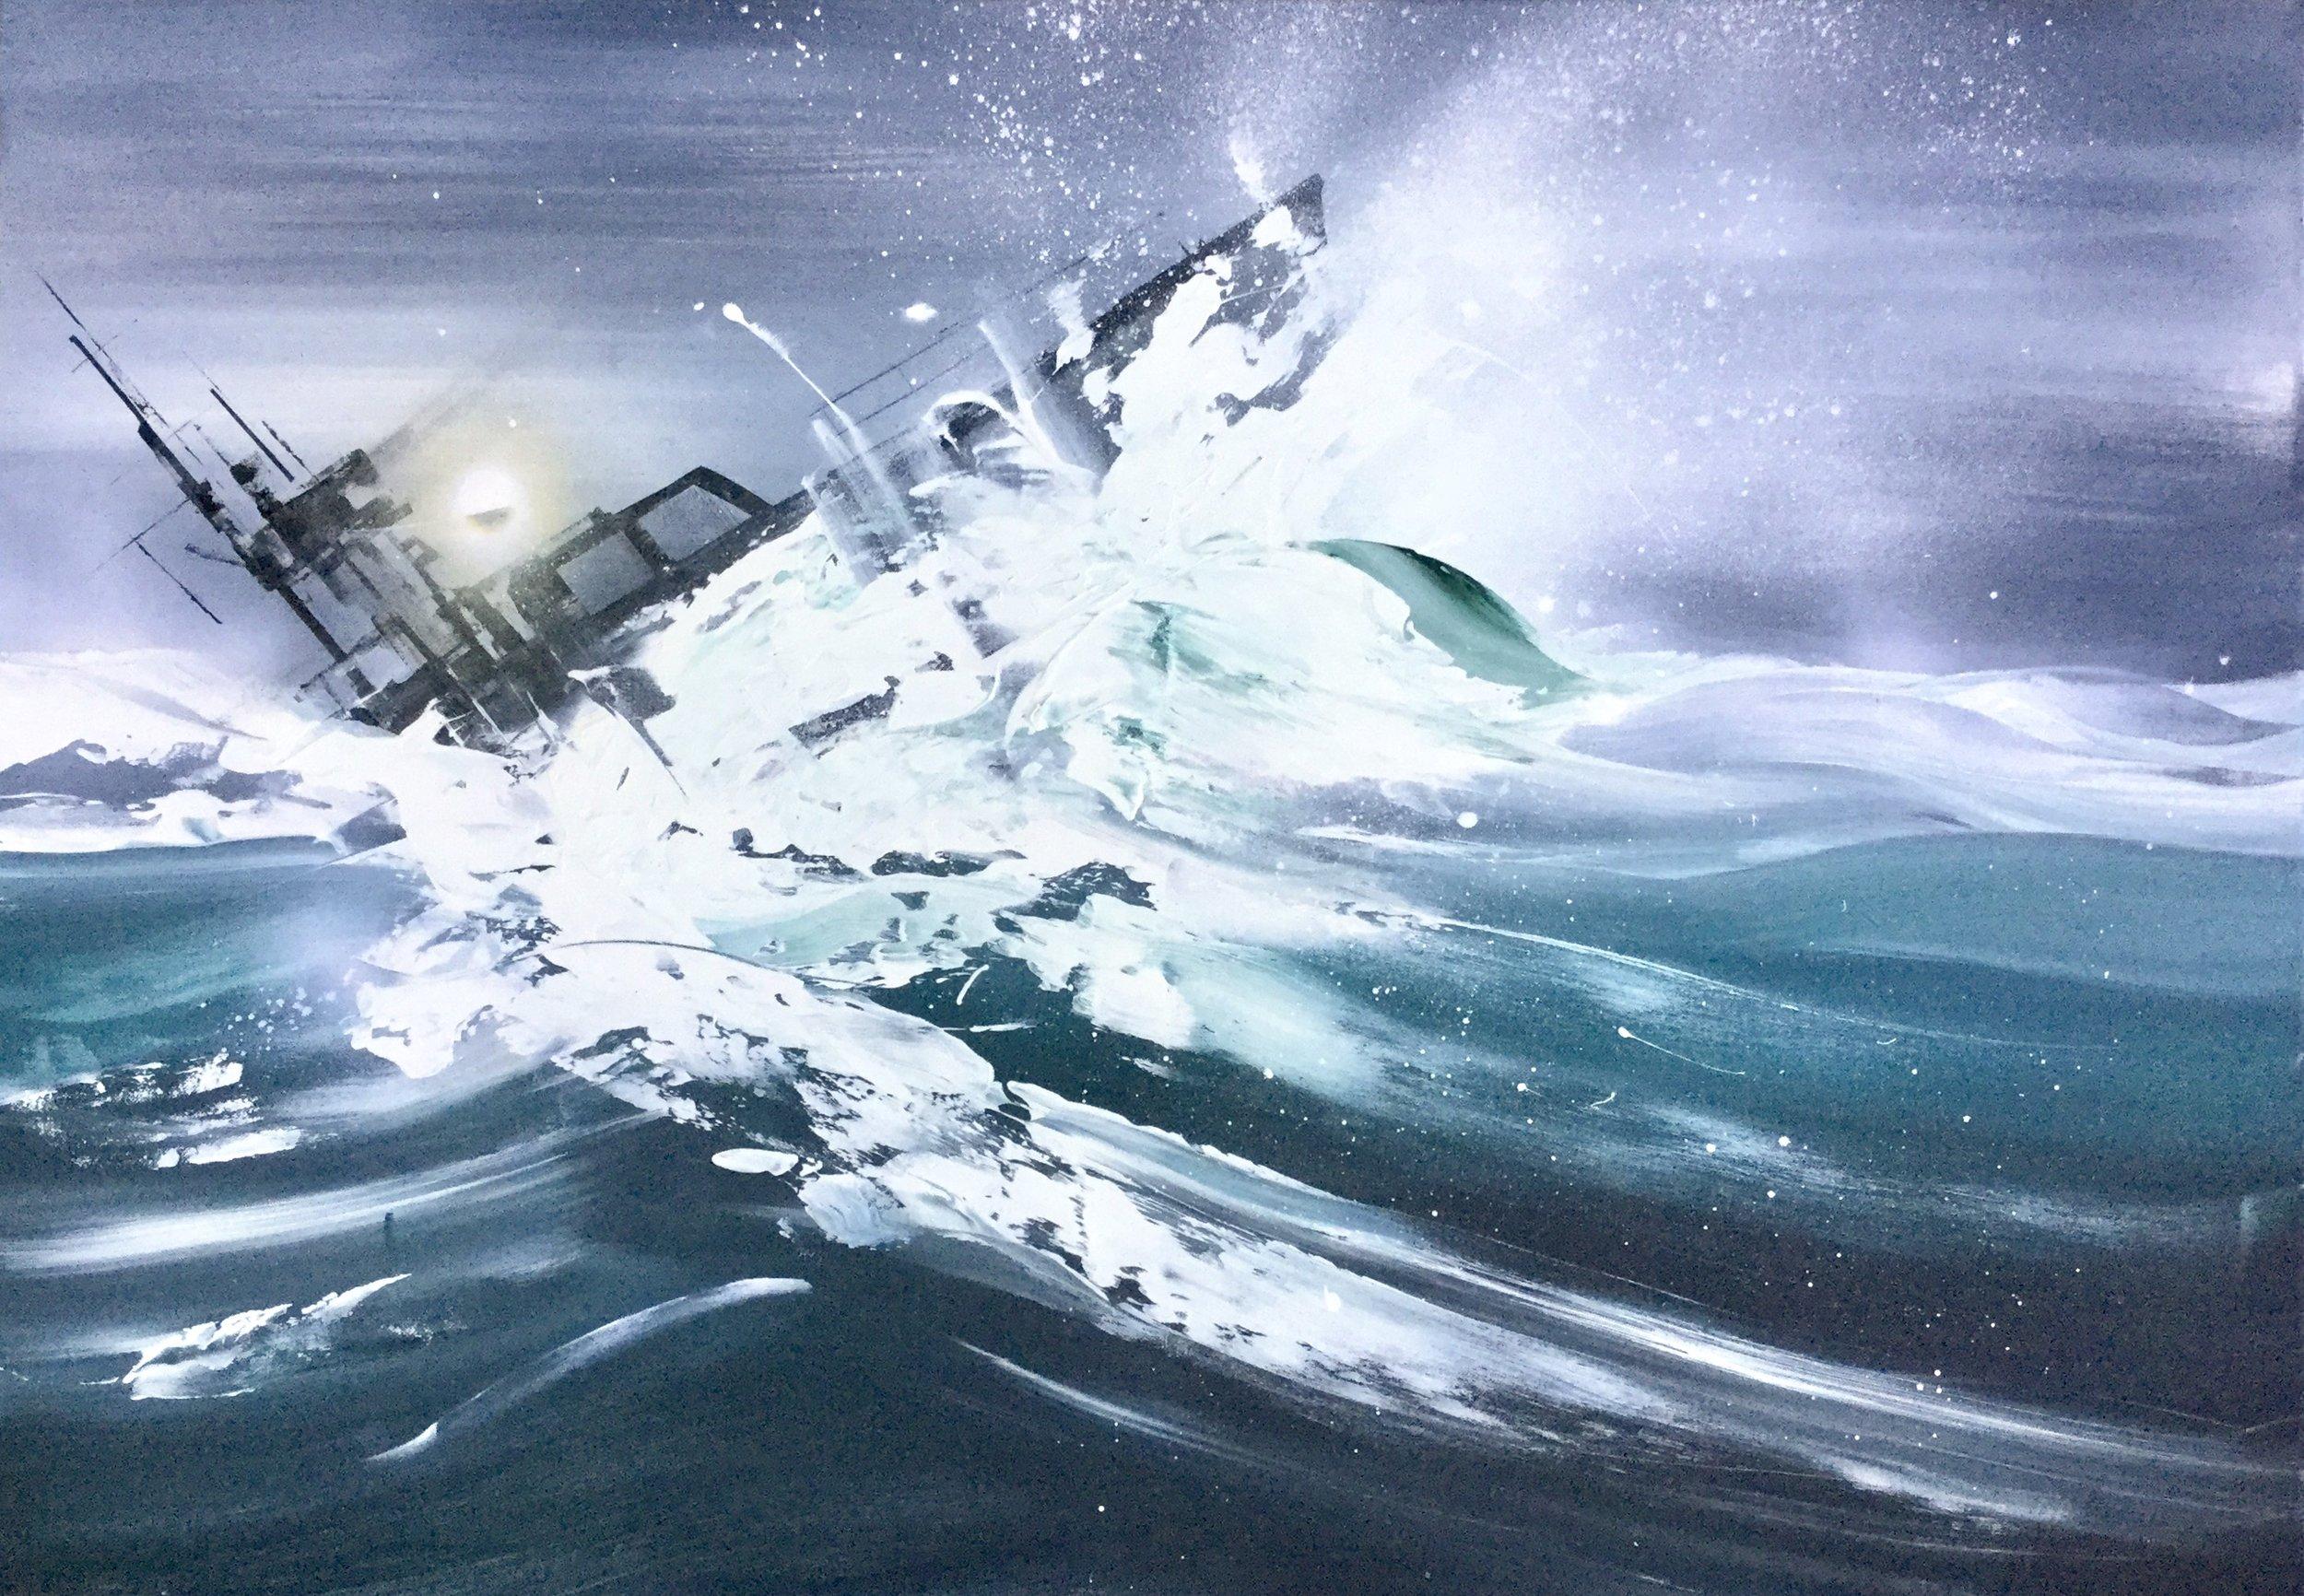 BOAT BATTLING THE WAVES Jirka.jpg